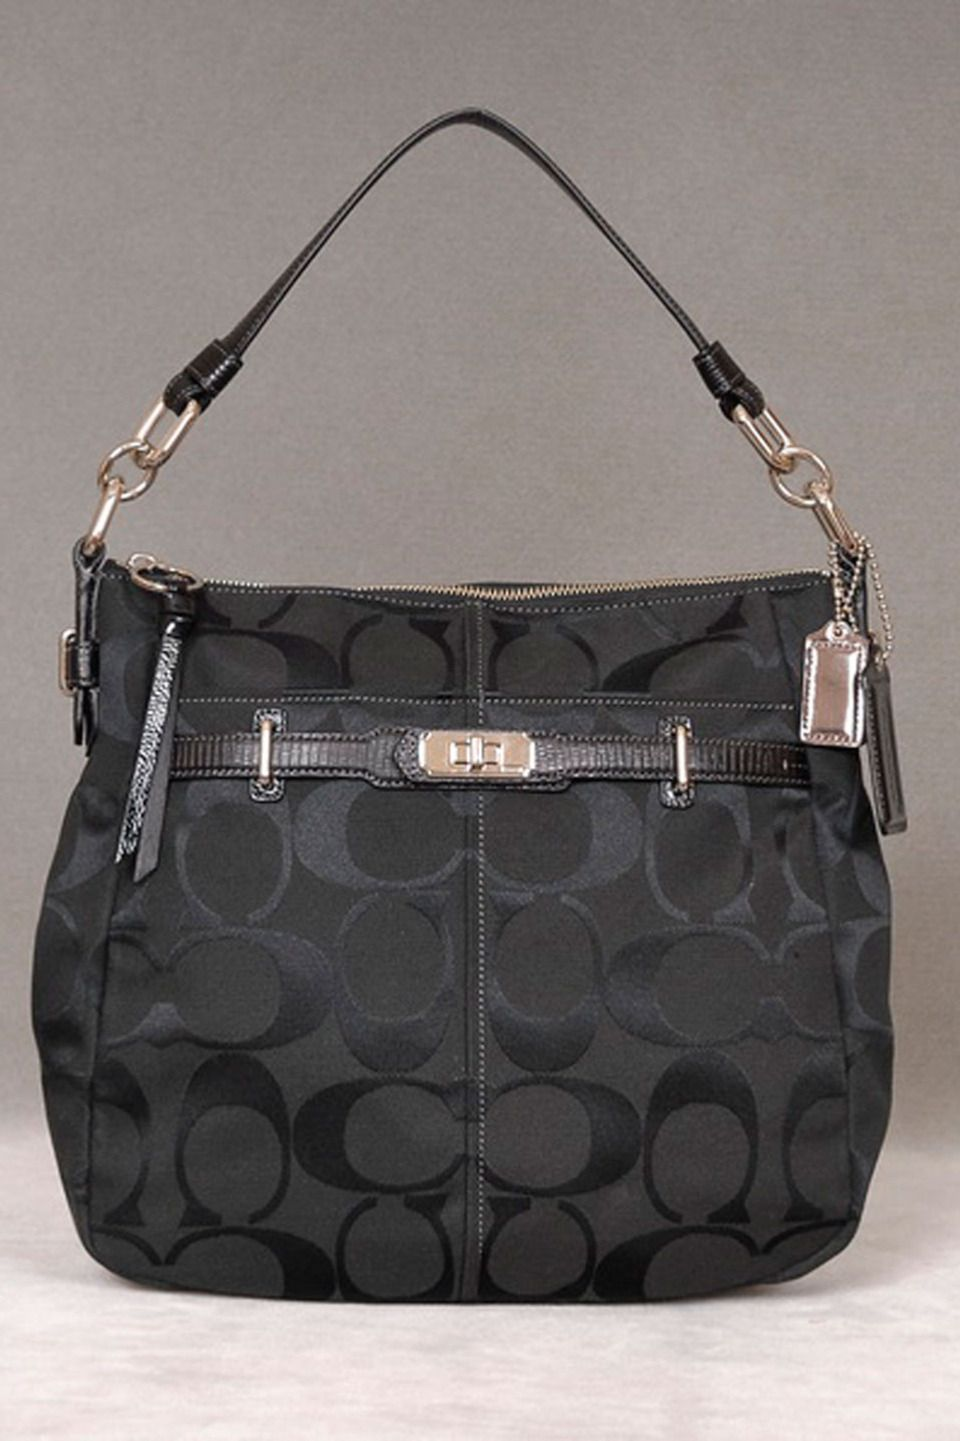 2013 latest coach handbags, coach designer handbags, womens cheap wholesale coach handbags ...